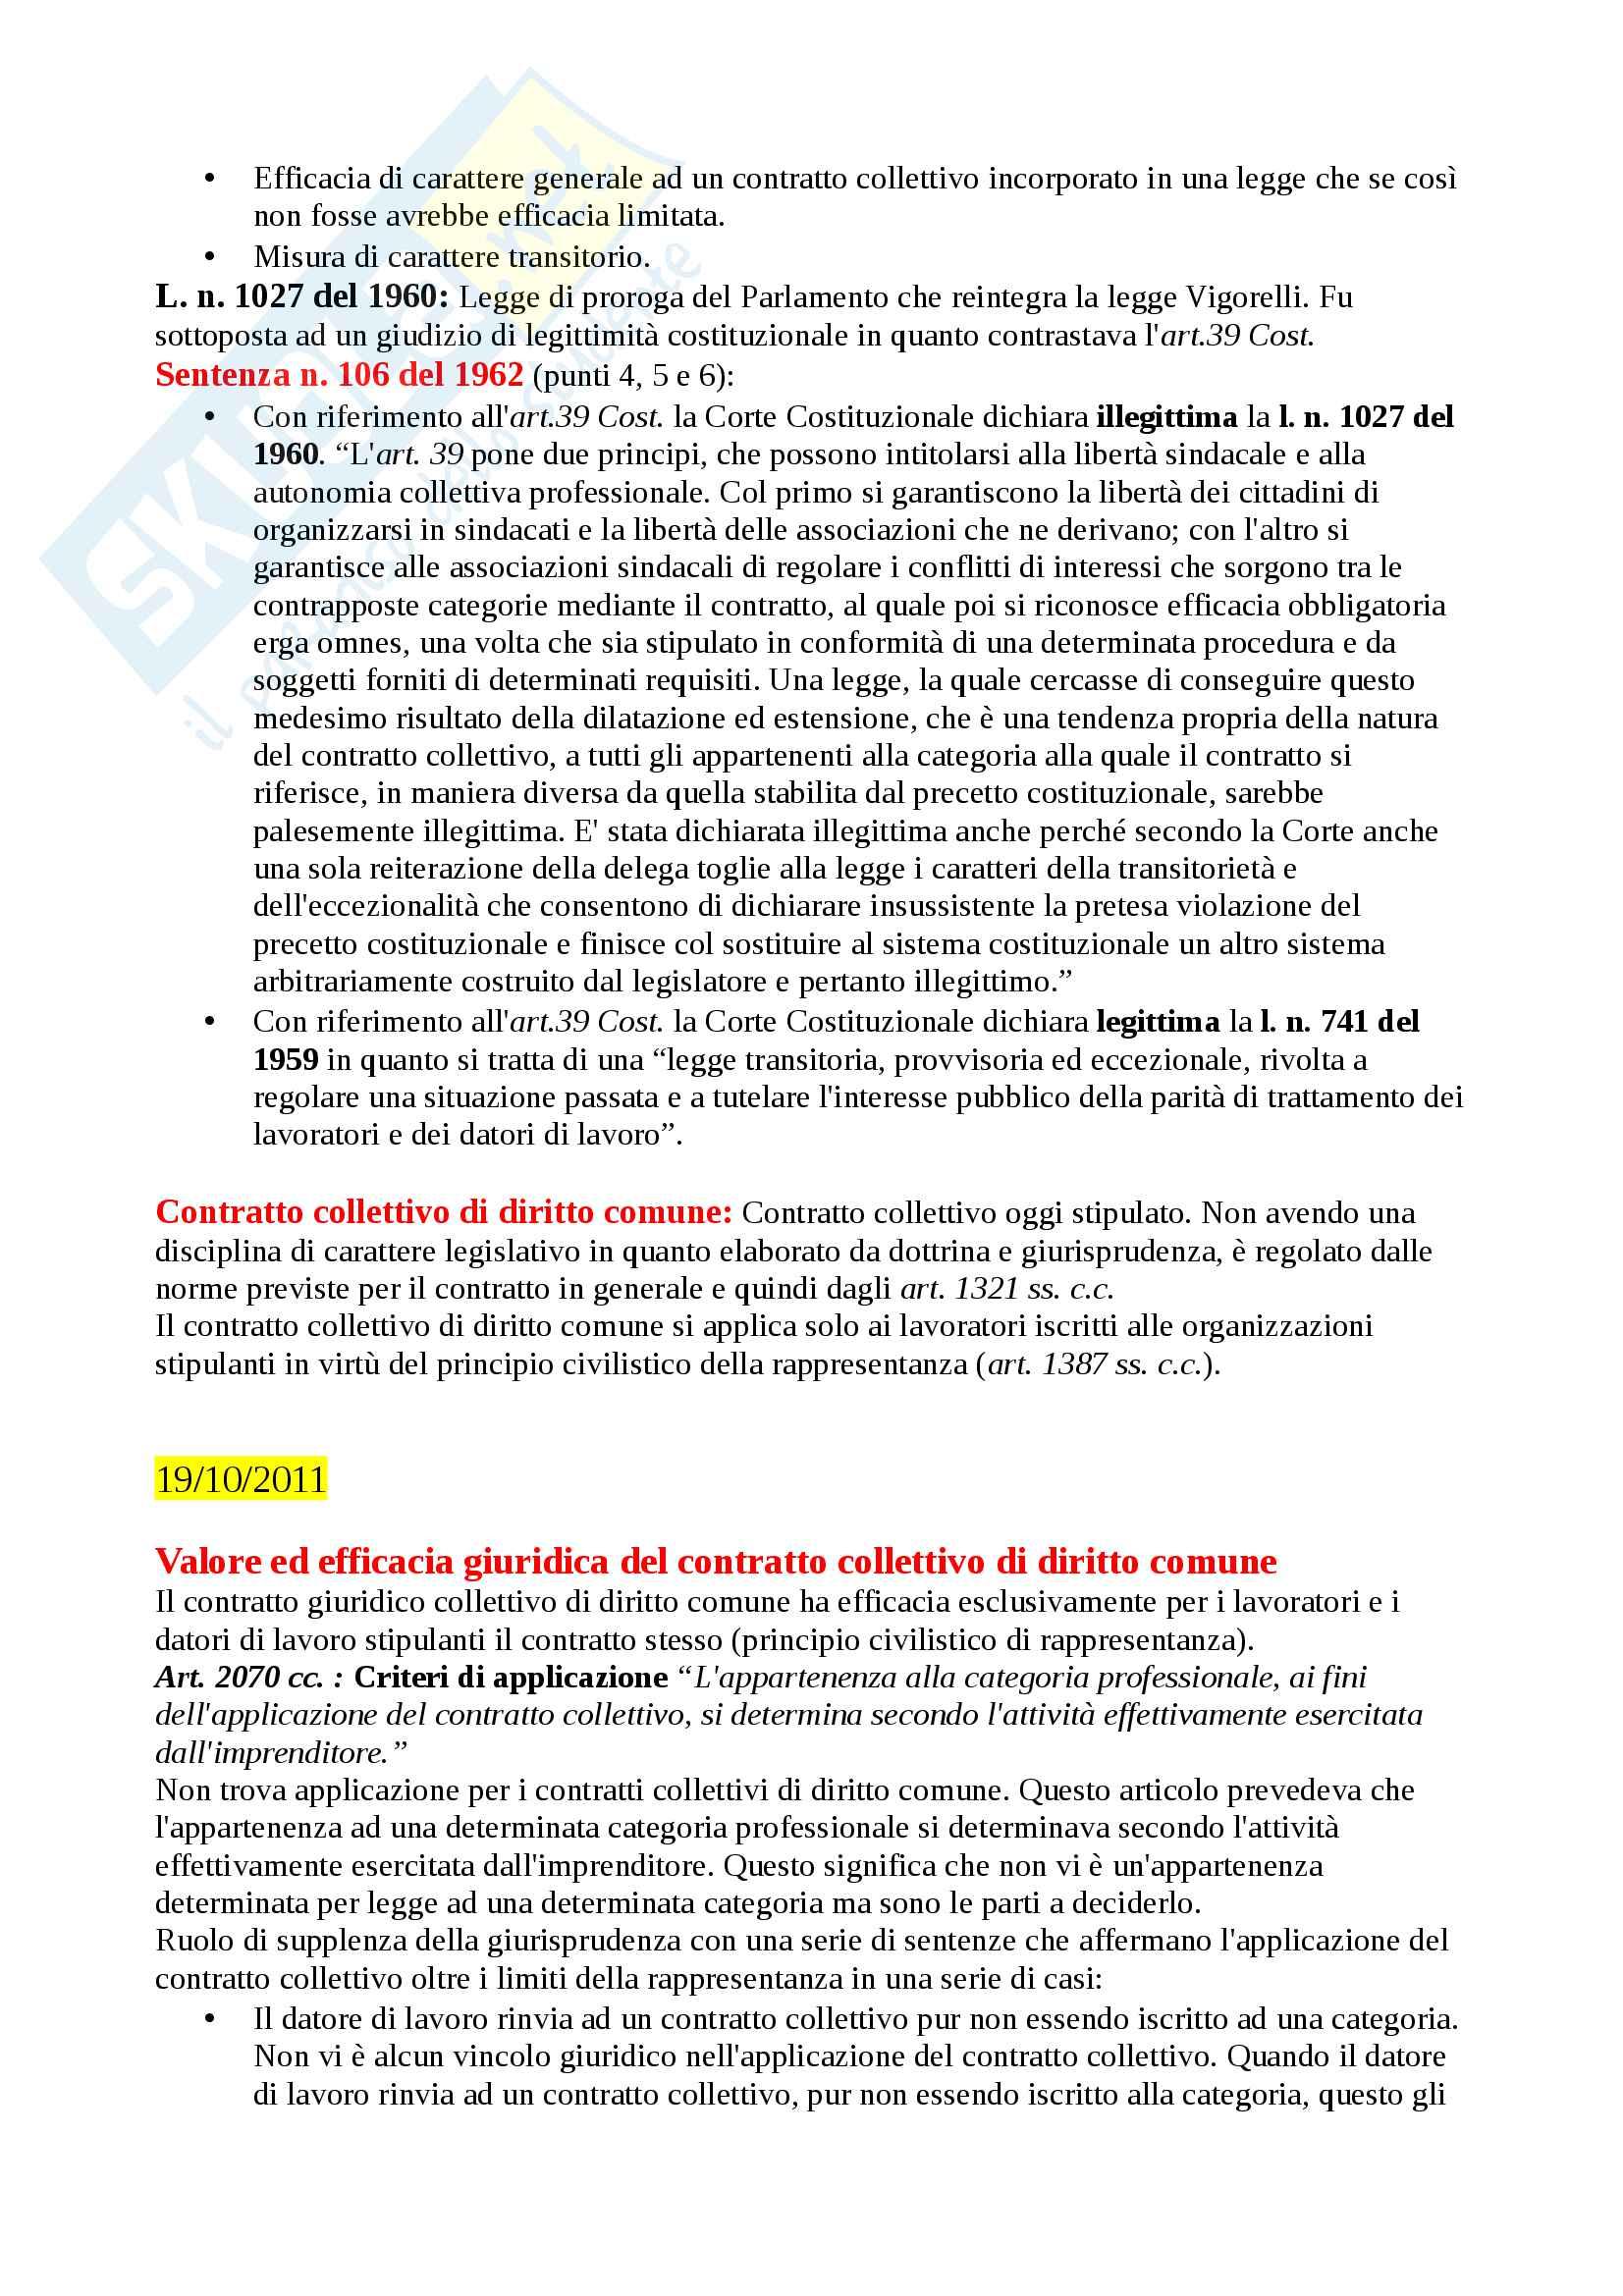 Appunti Diritto Sindacale 2011 Lucio Imberti Pag. 11